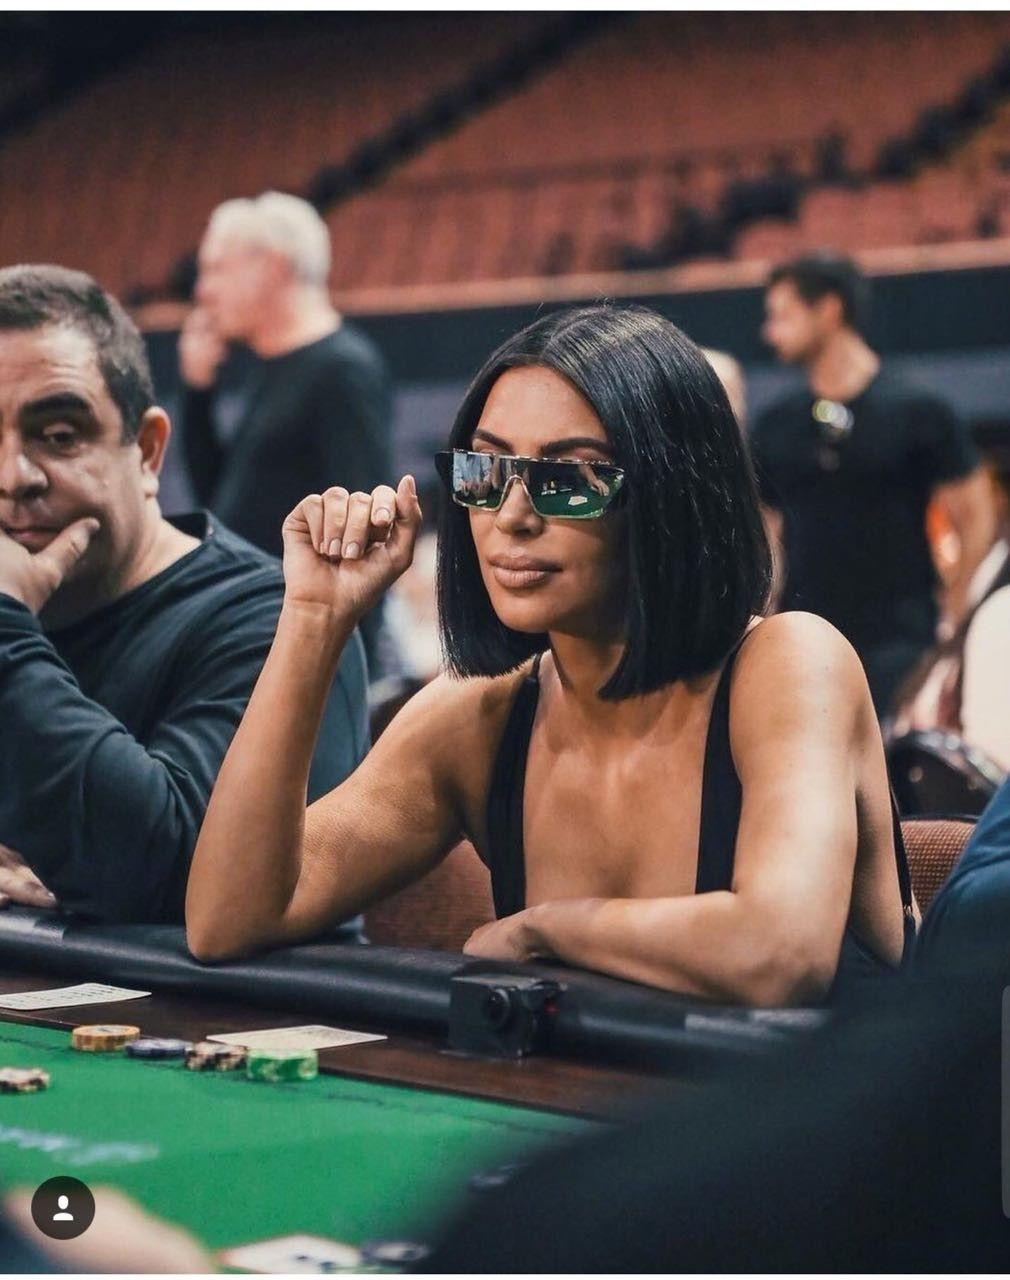 Kim Kardashian Playing Poker : kardashian, playing, poker, Ailsa, Kardashians, Kardashian,, Kanye